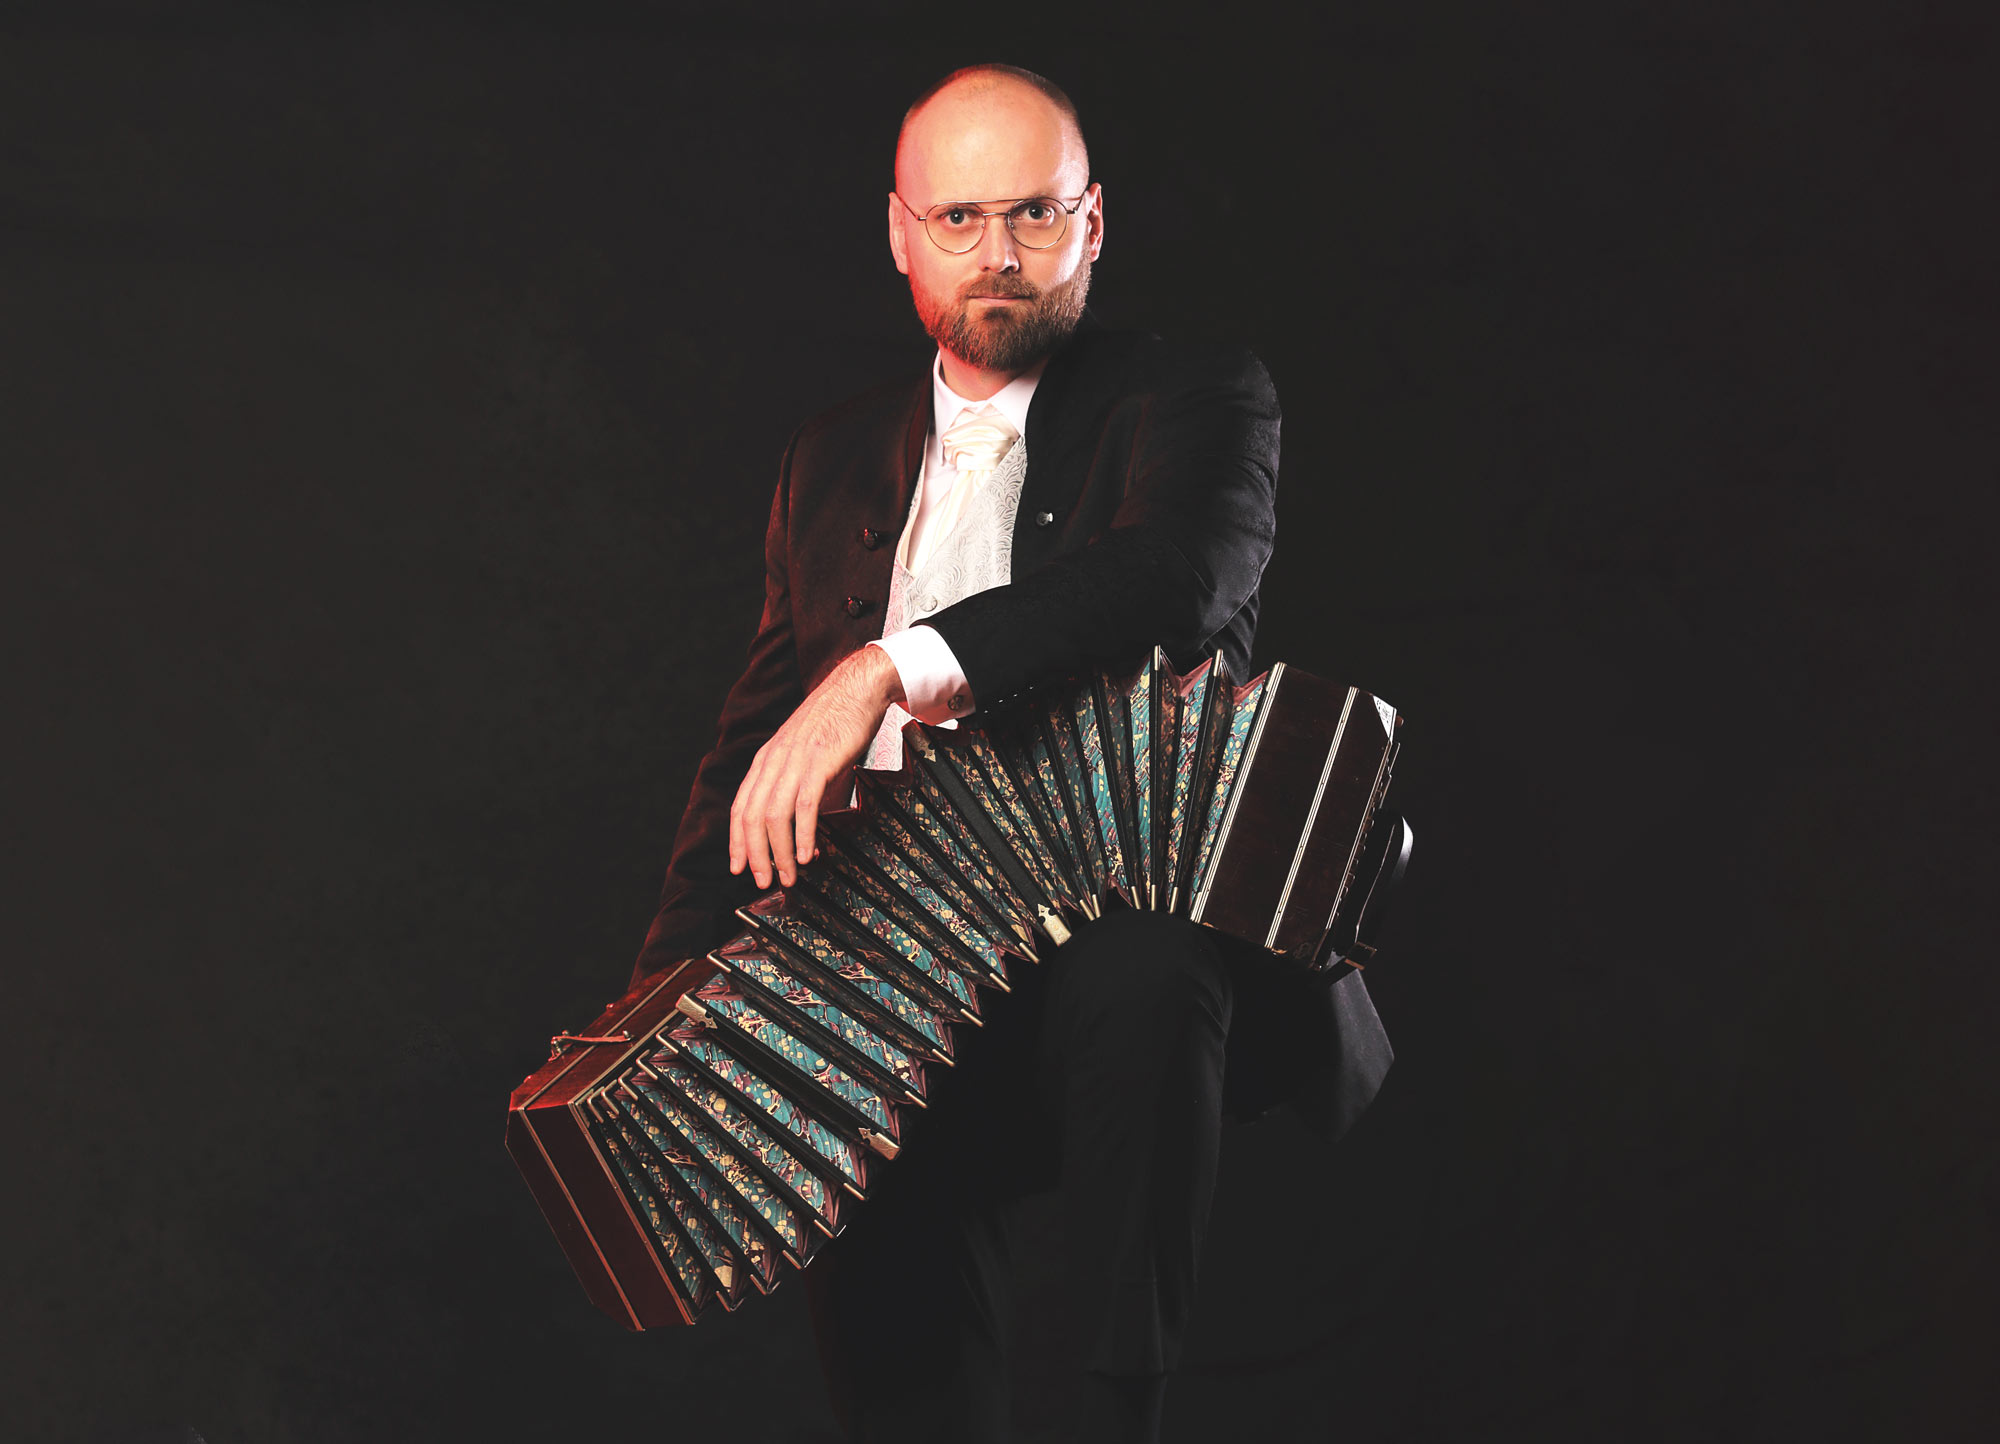 Bandoneontaiteilija Henrik Sandås